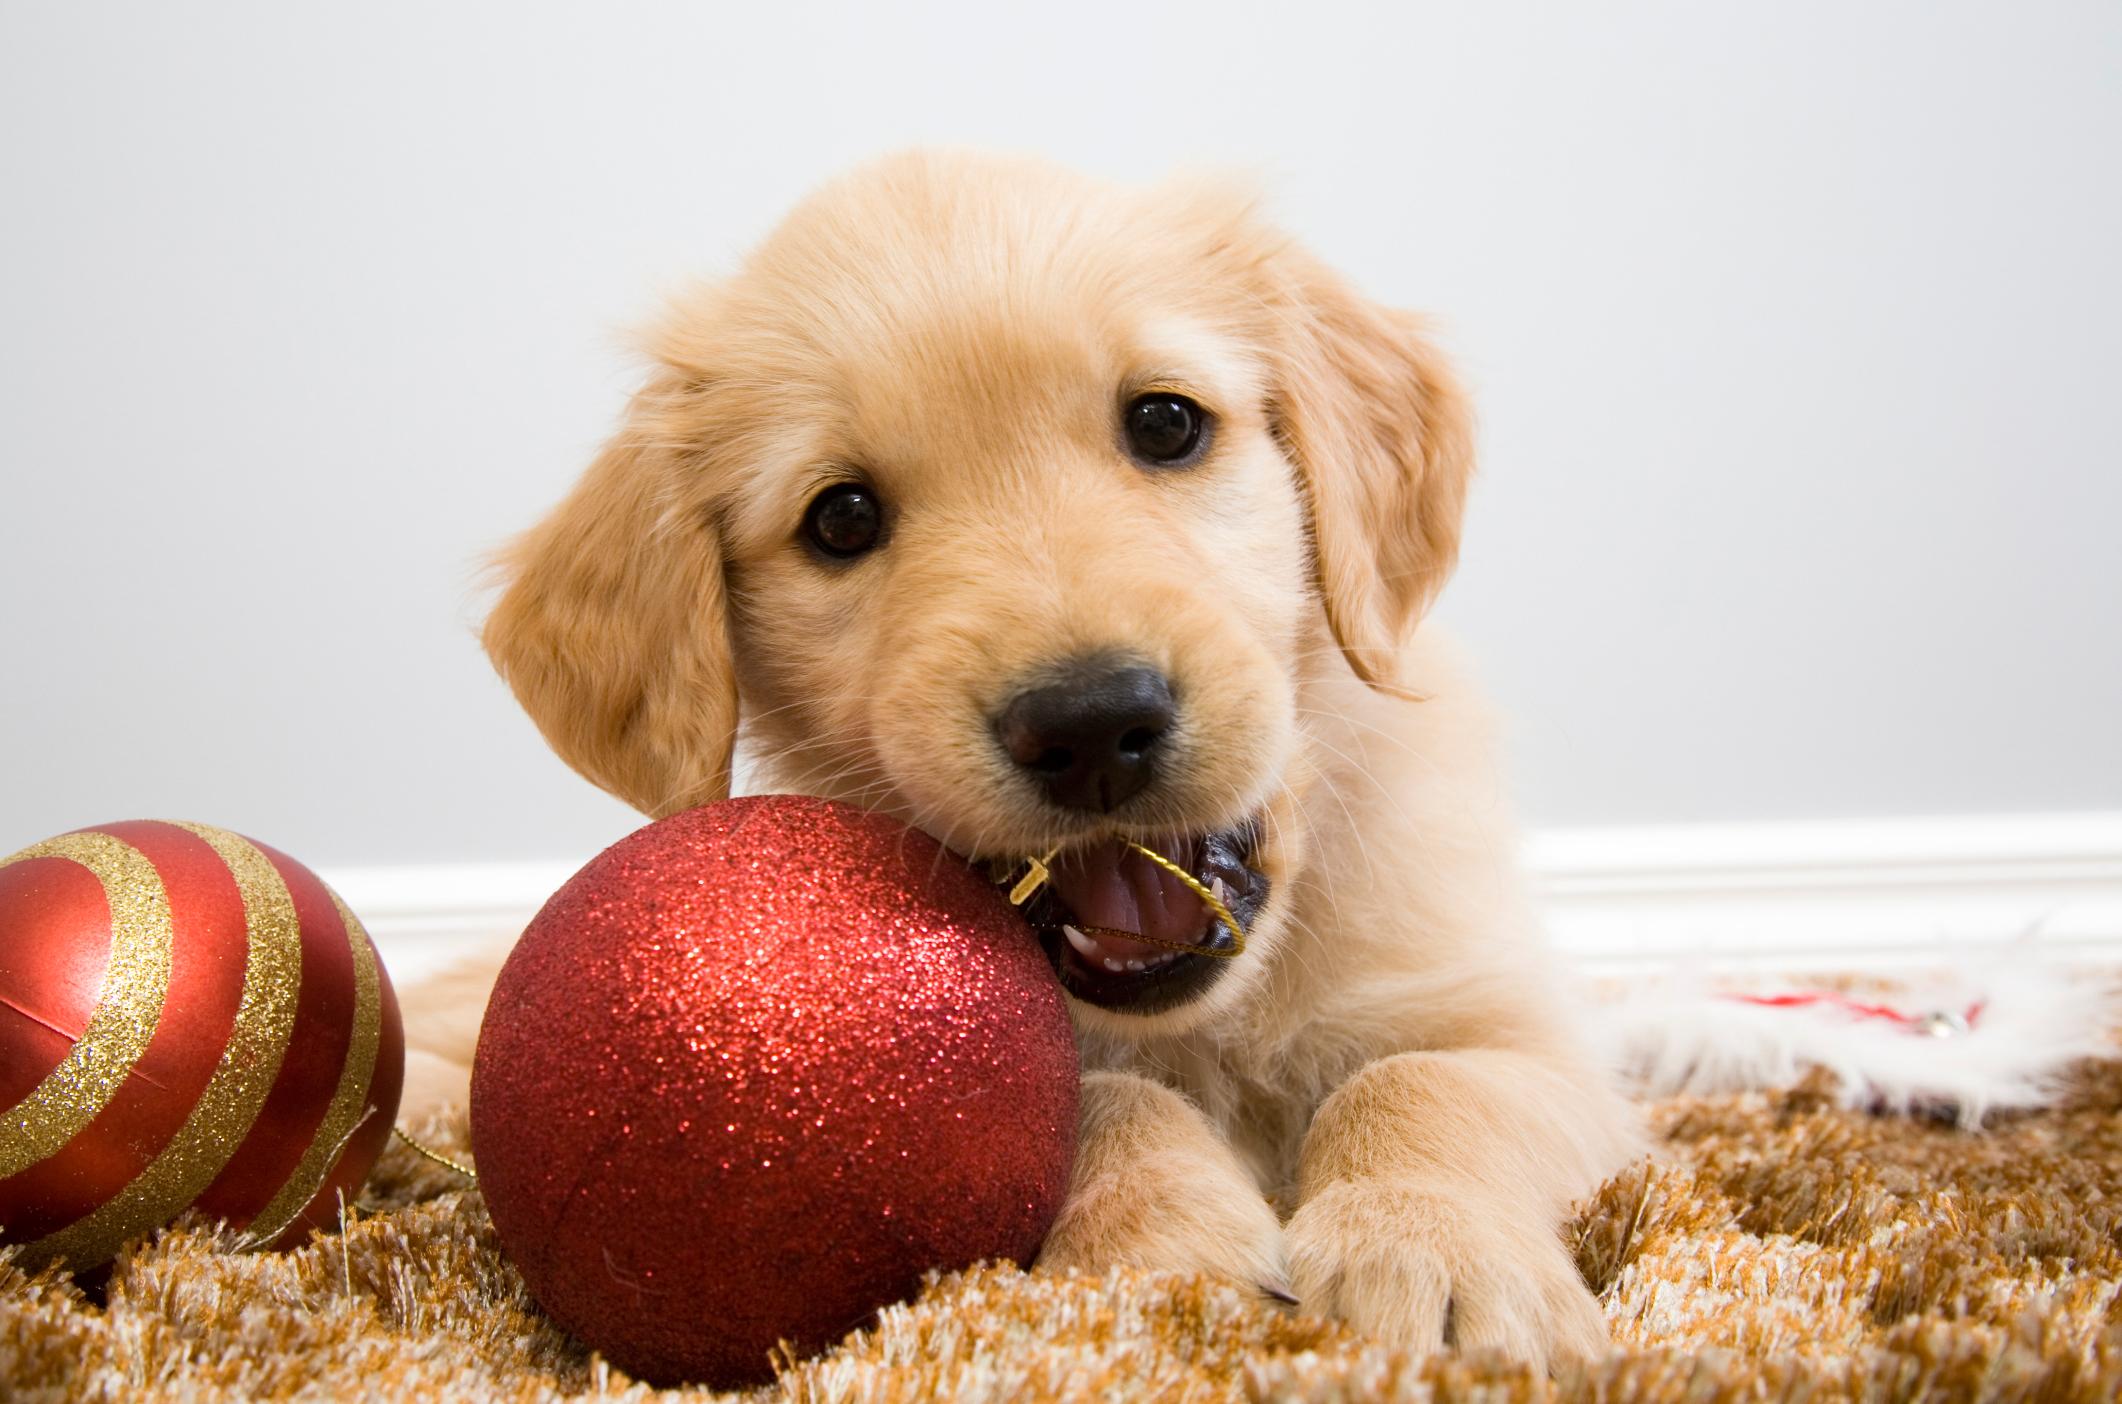 Christmas Dog Wallpapers - Wallpaper Cave  |Cute Christmas Dog